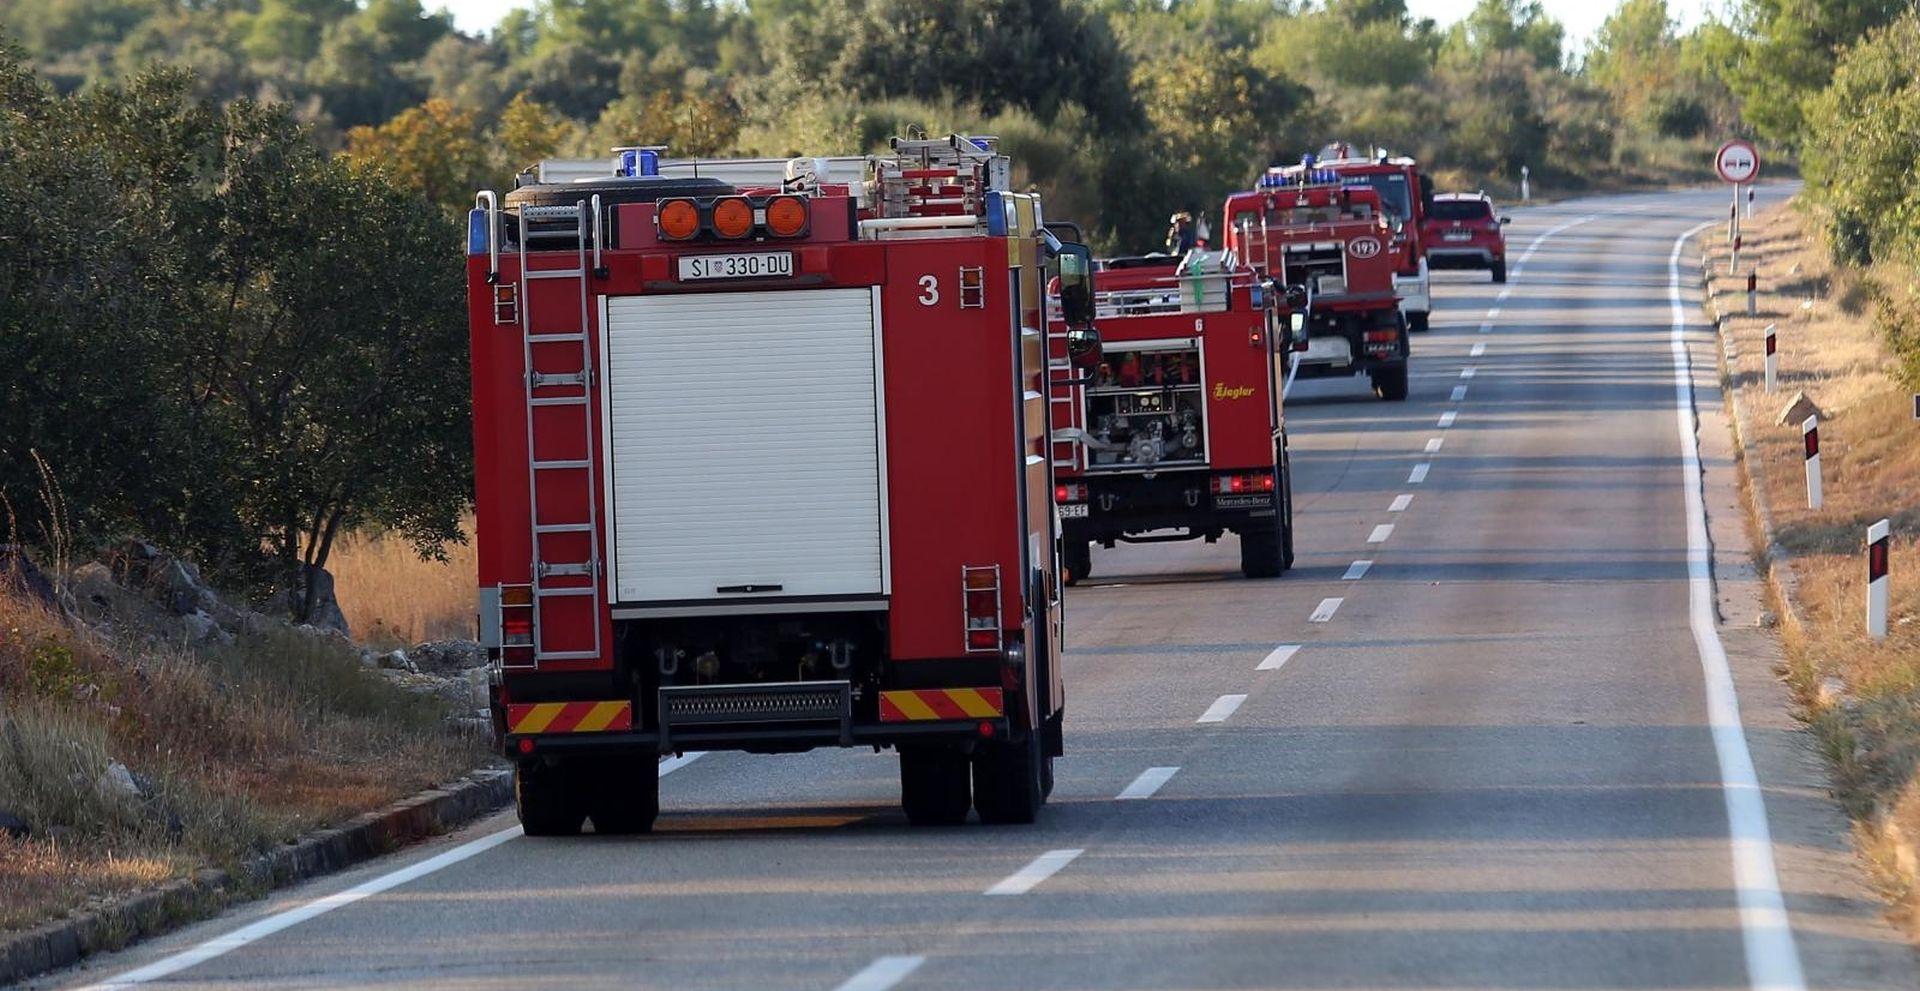 Uzrok požara u Kuli Norinskoj otvoreni plamen